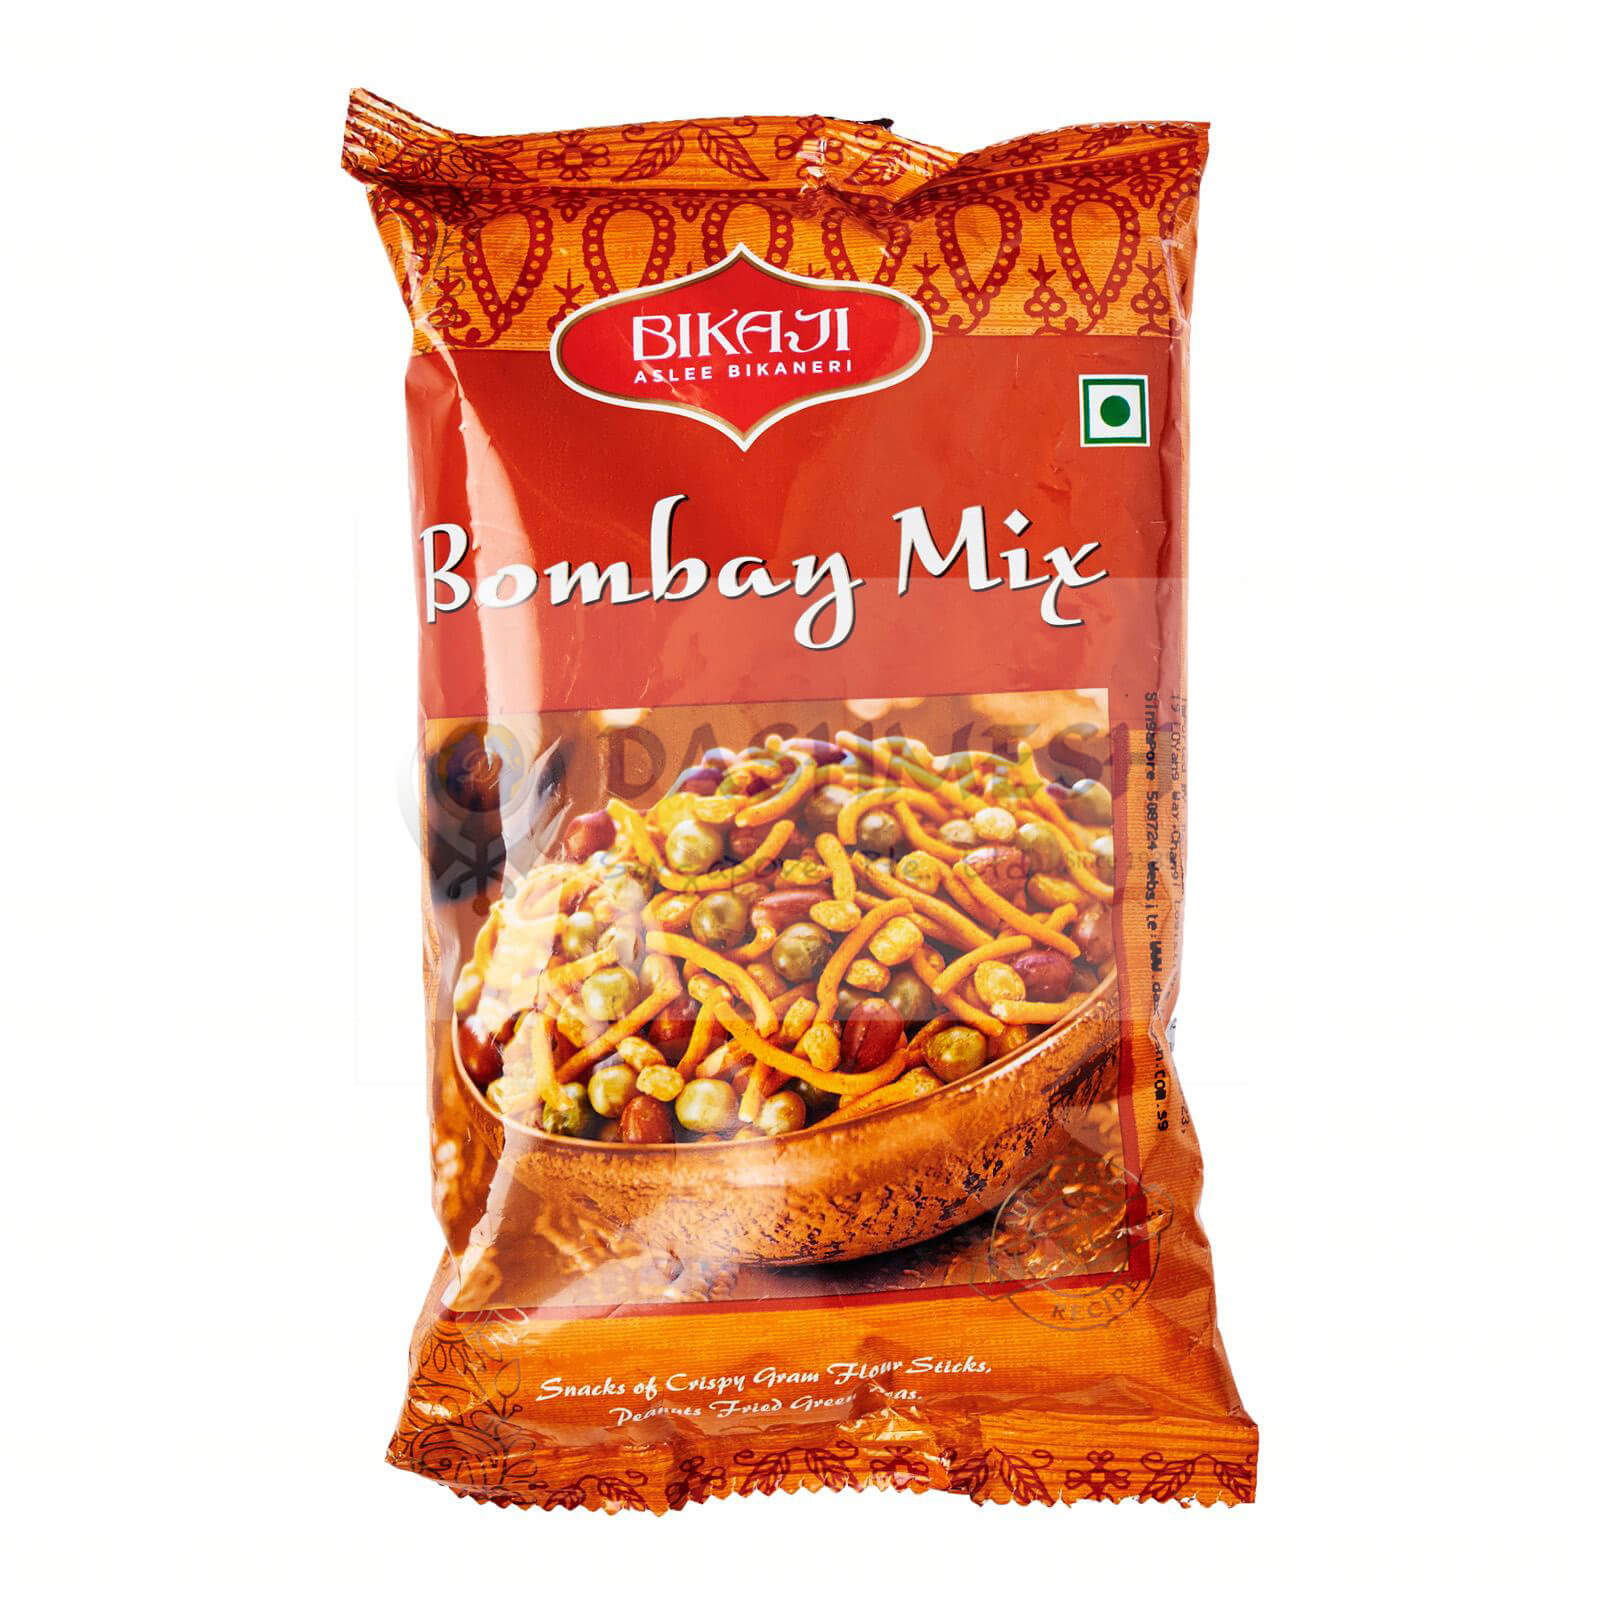 Bikaji Bombay Mix 200g